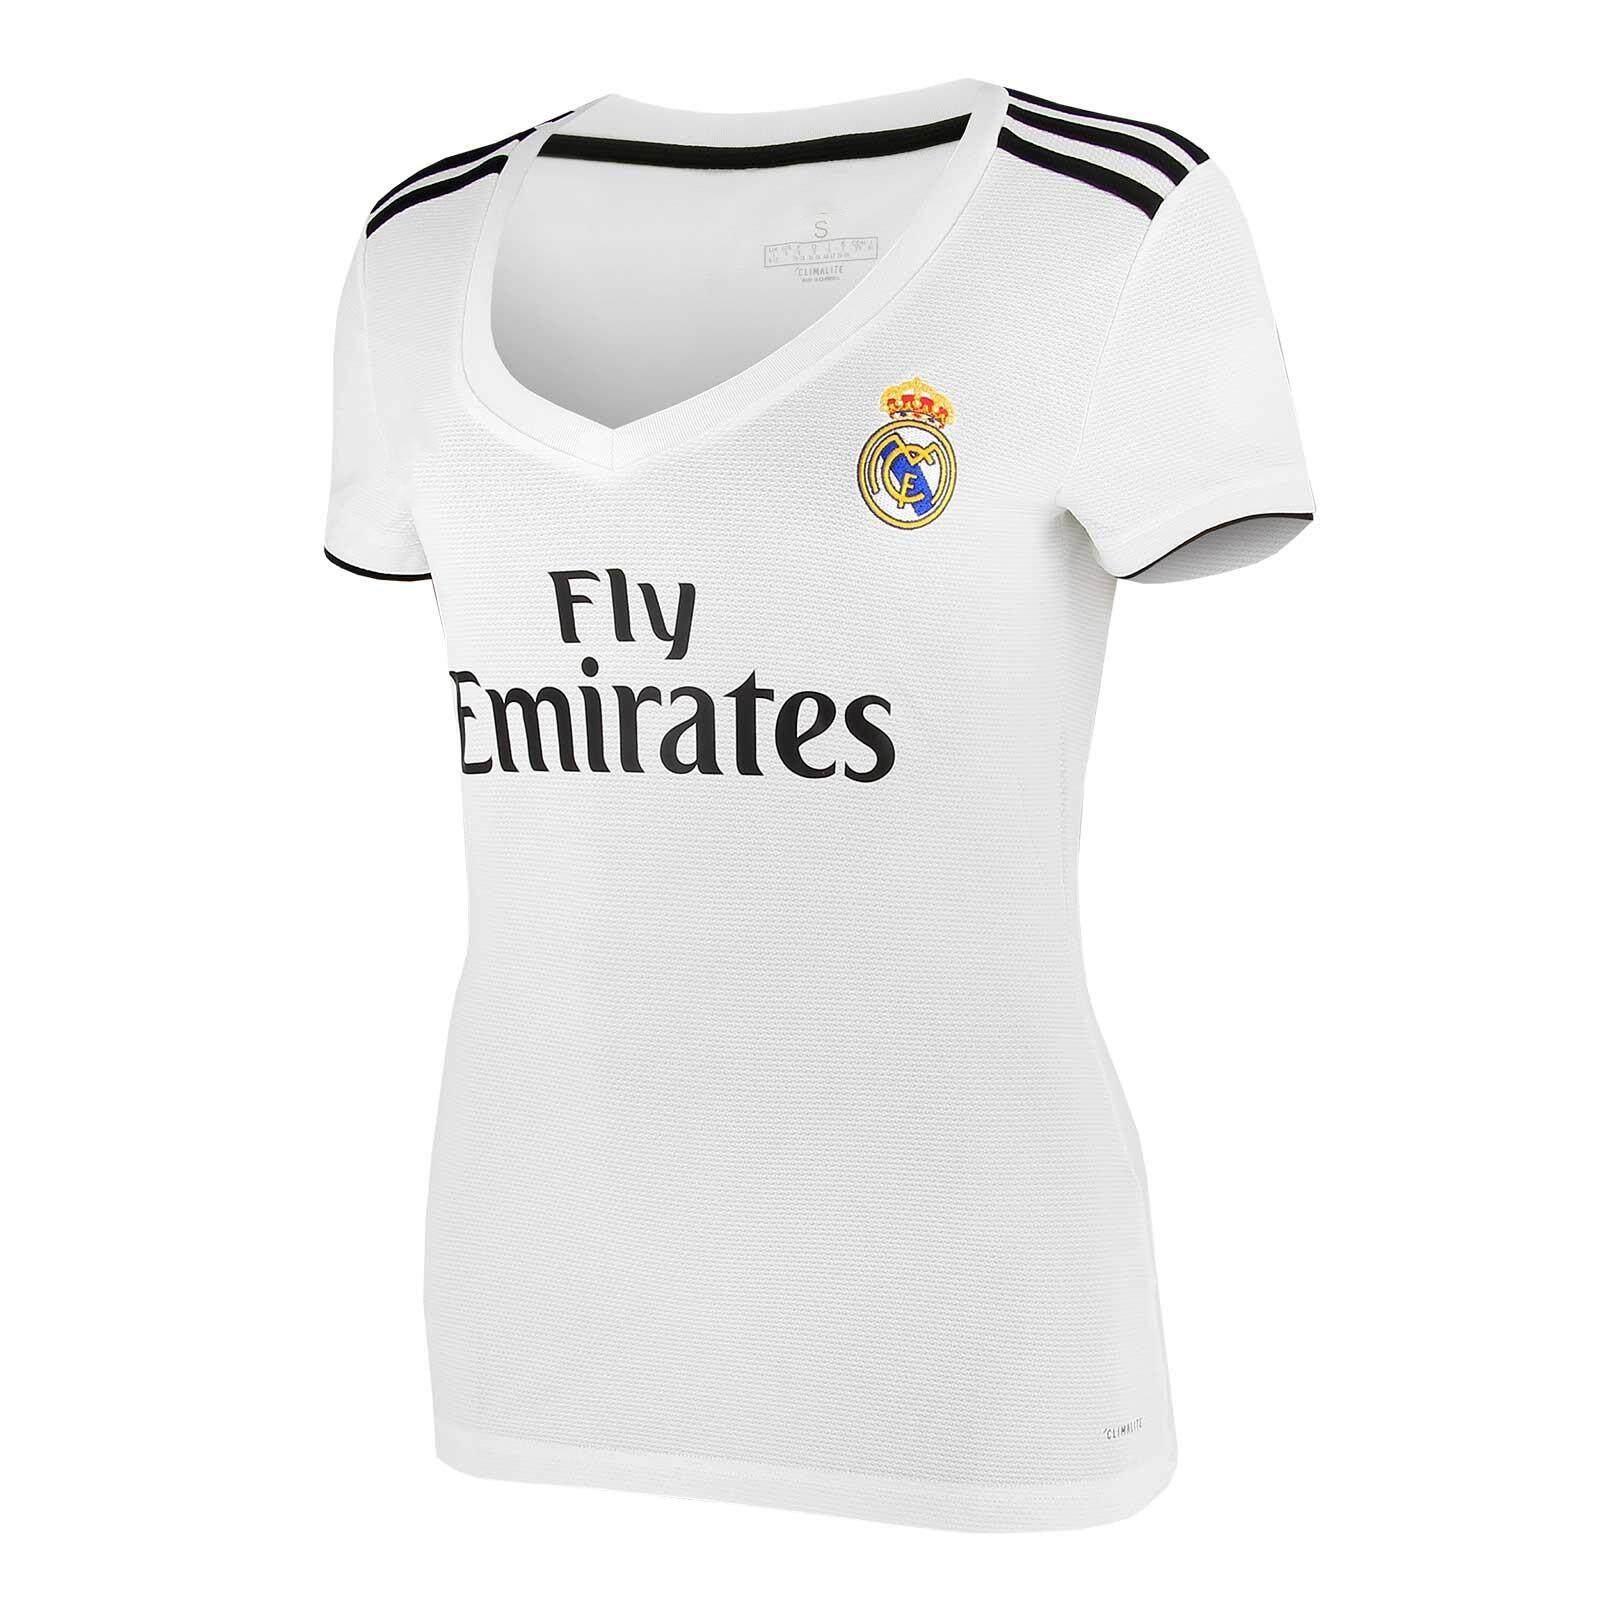 5d7683209 Football Jersey for Women for sale - Womens Football Jersey Online ...